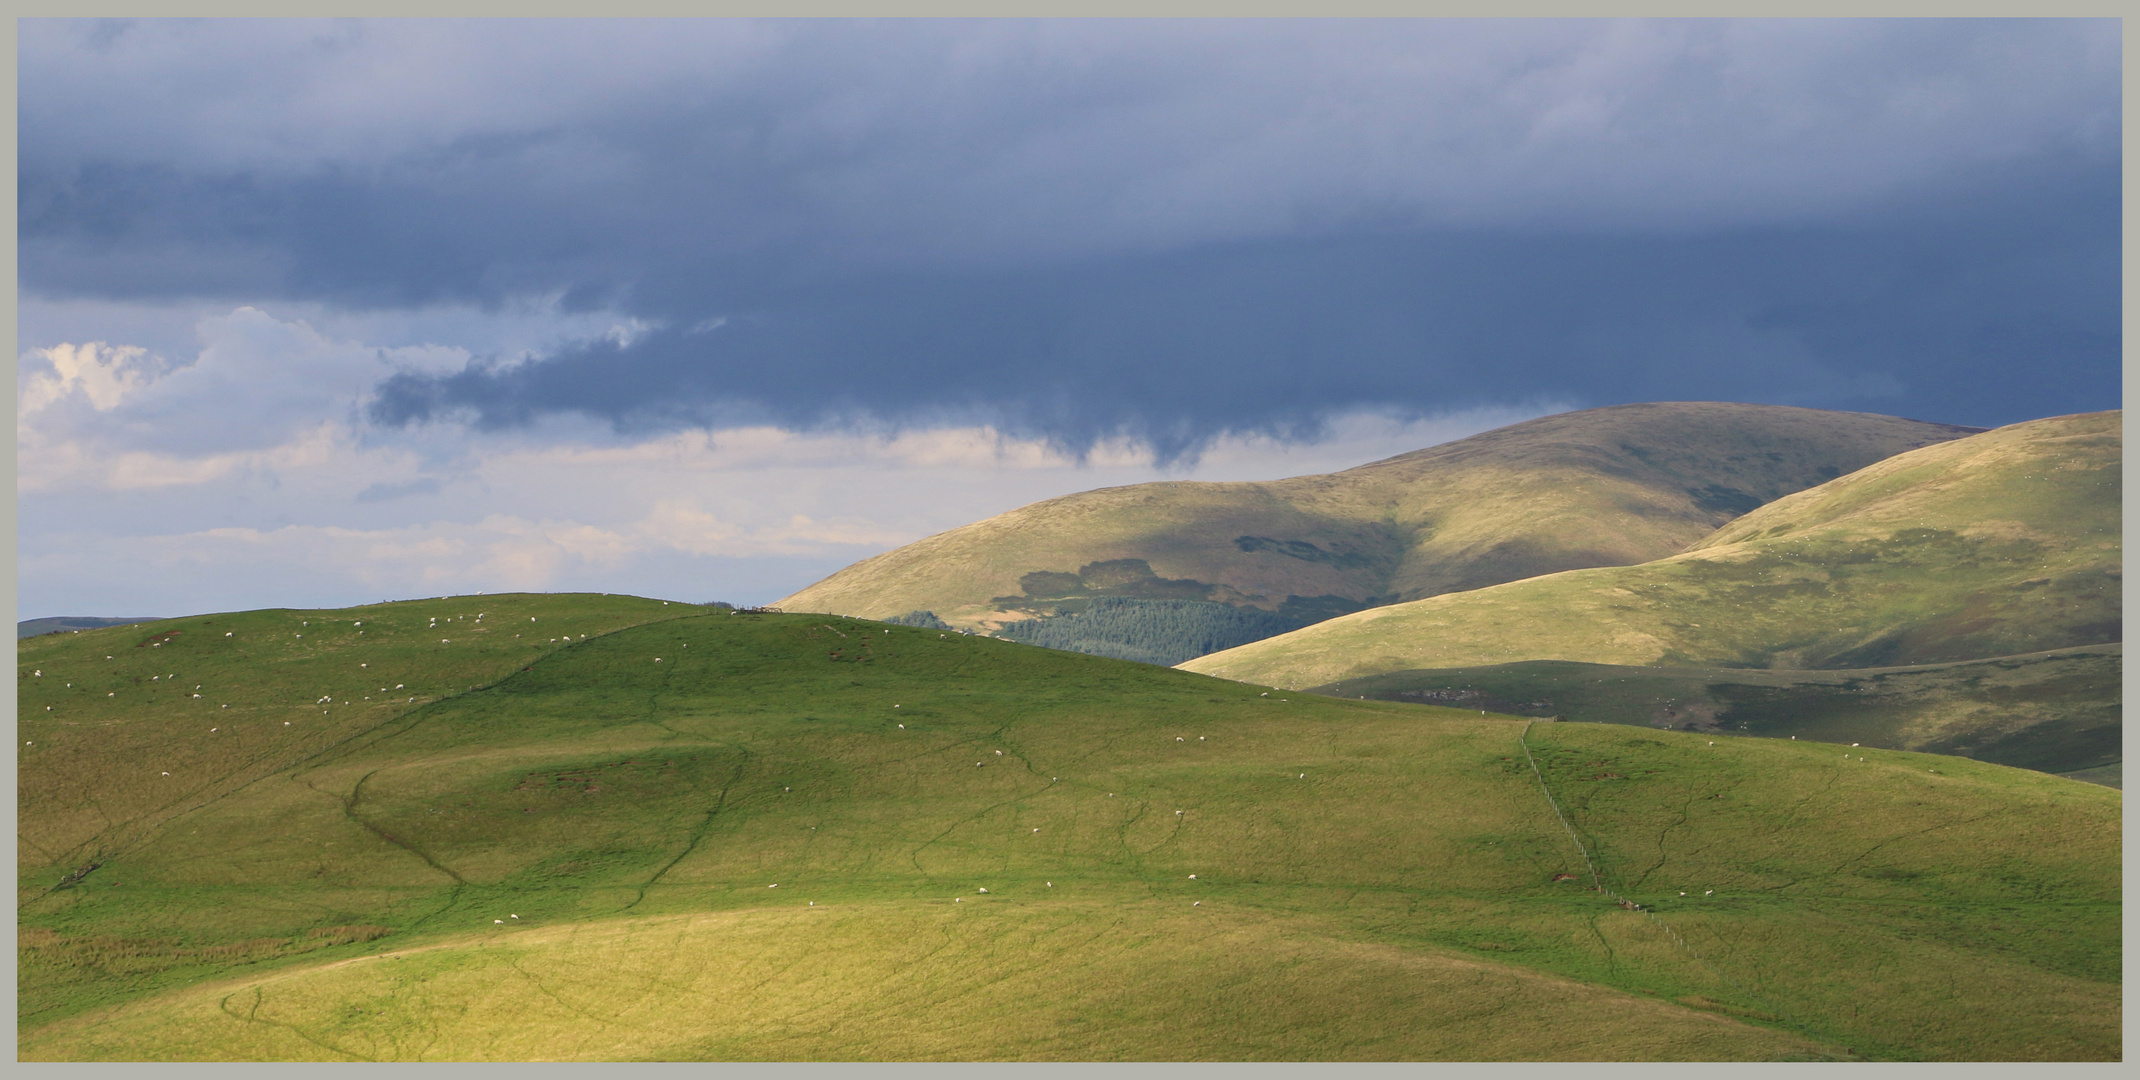 cheviot hills near Hownam in Scotland